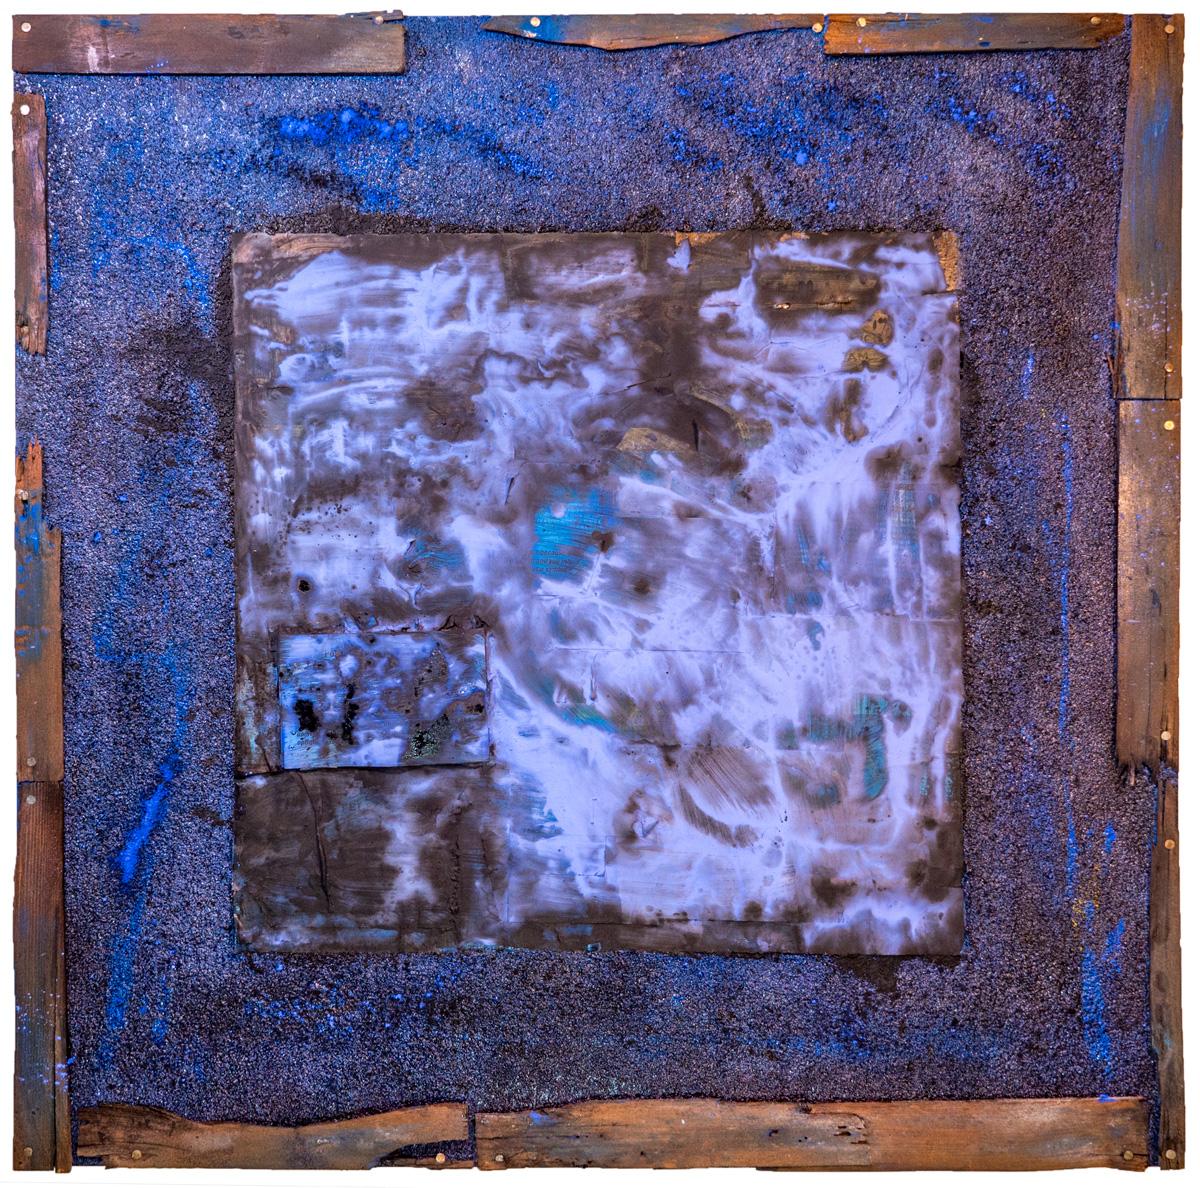 Blue Square Squared